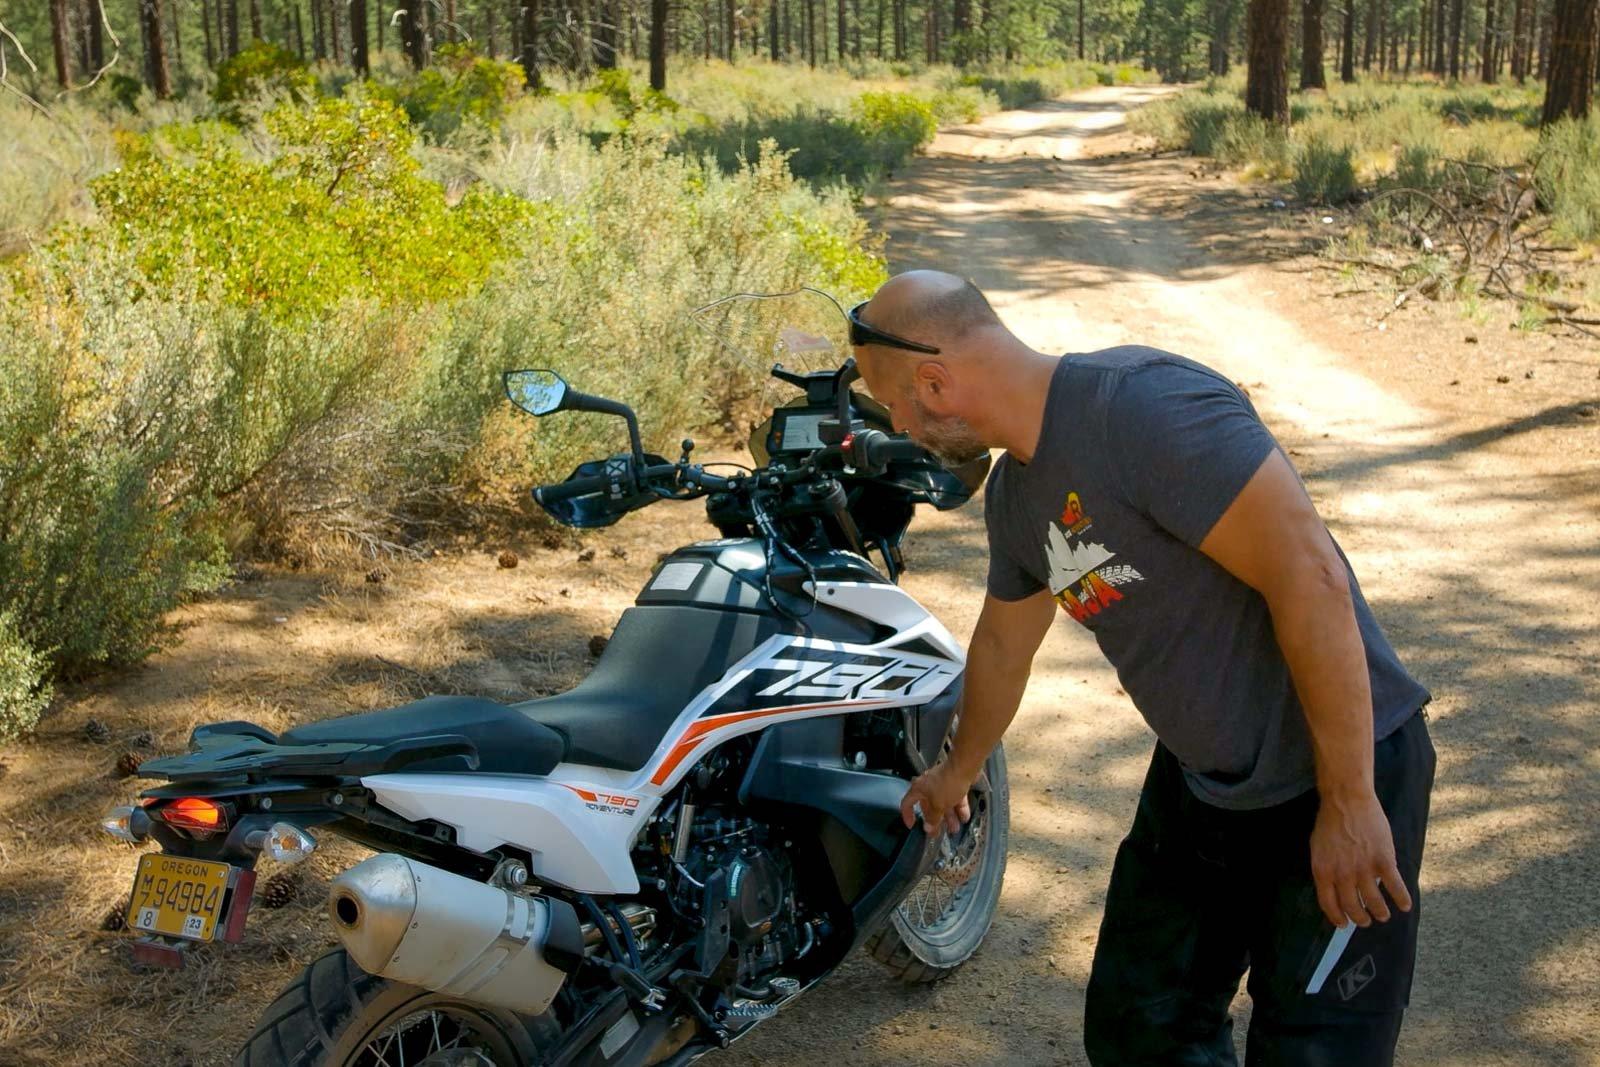 Eric points out the KTM 790's low slung fuel tank